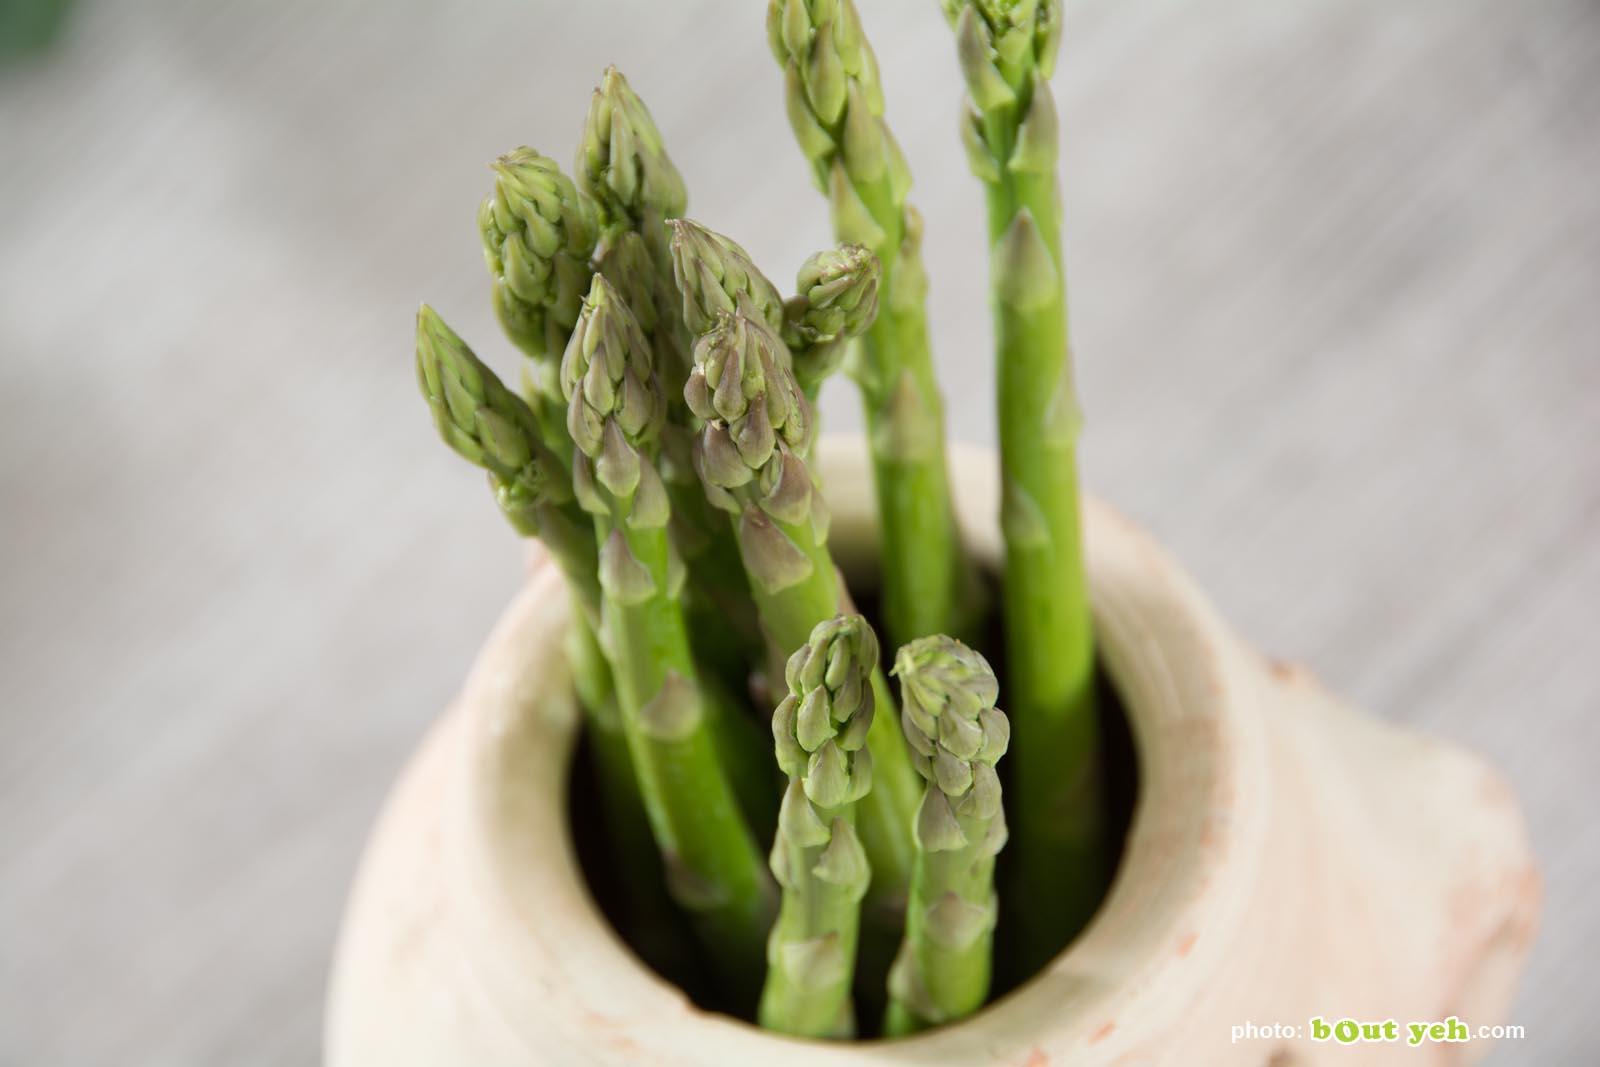 Food photographers Belfast portfolio photo 3365 - fresh asparagus tips